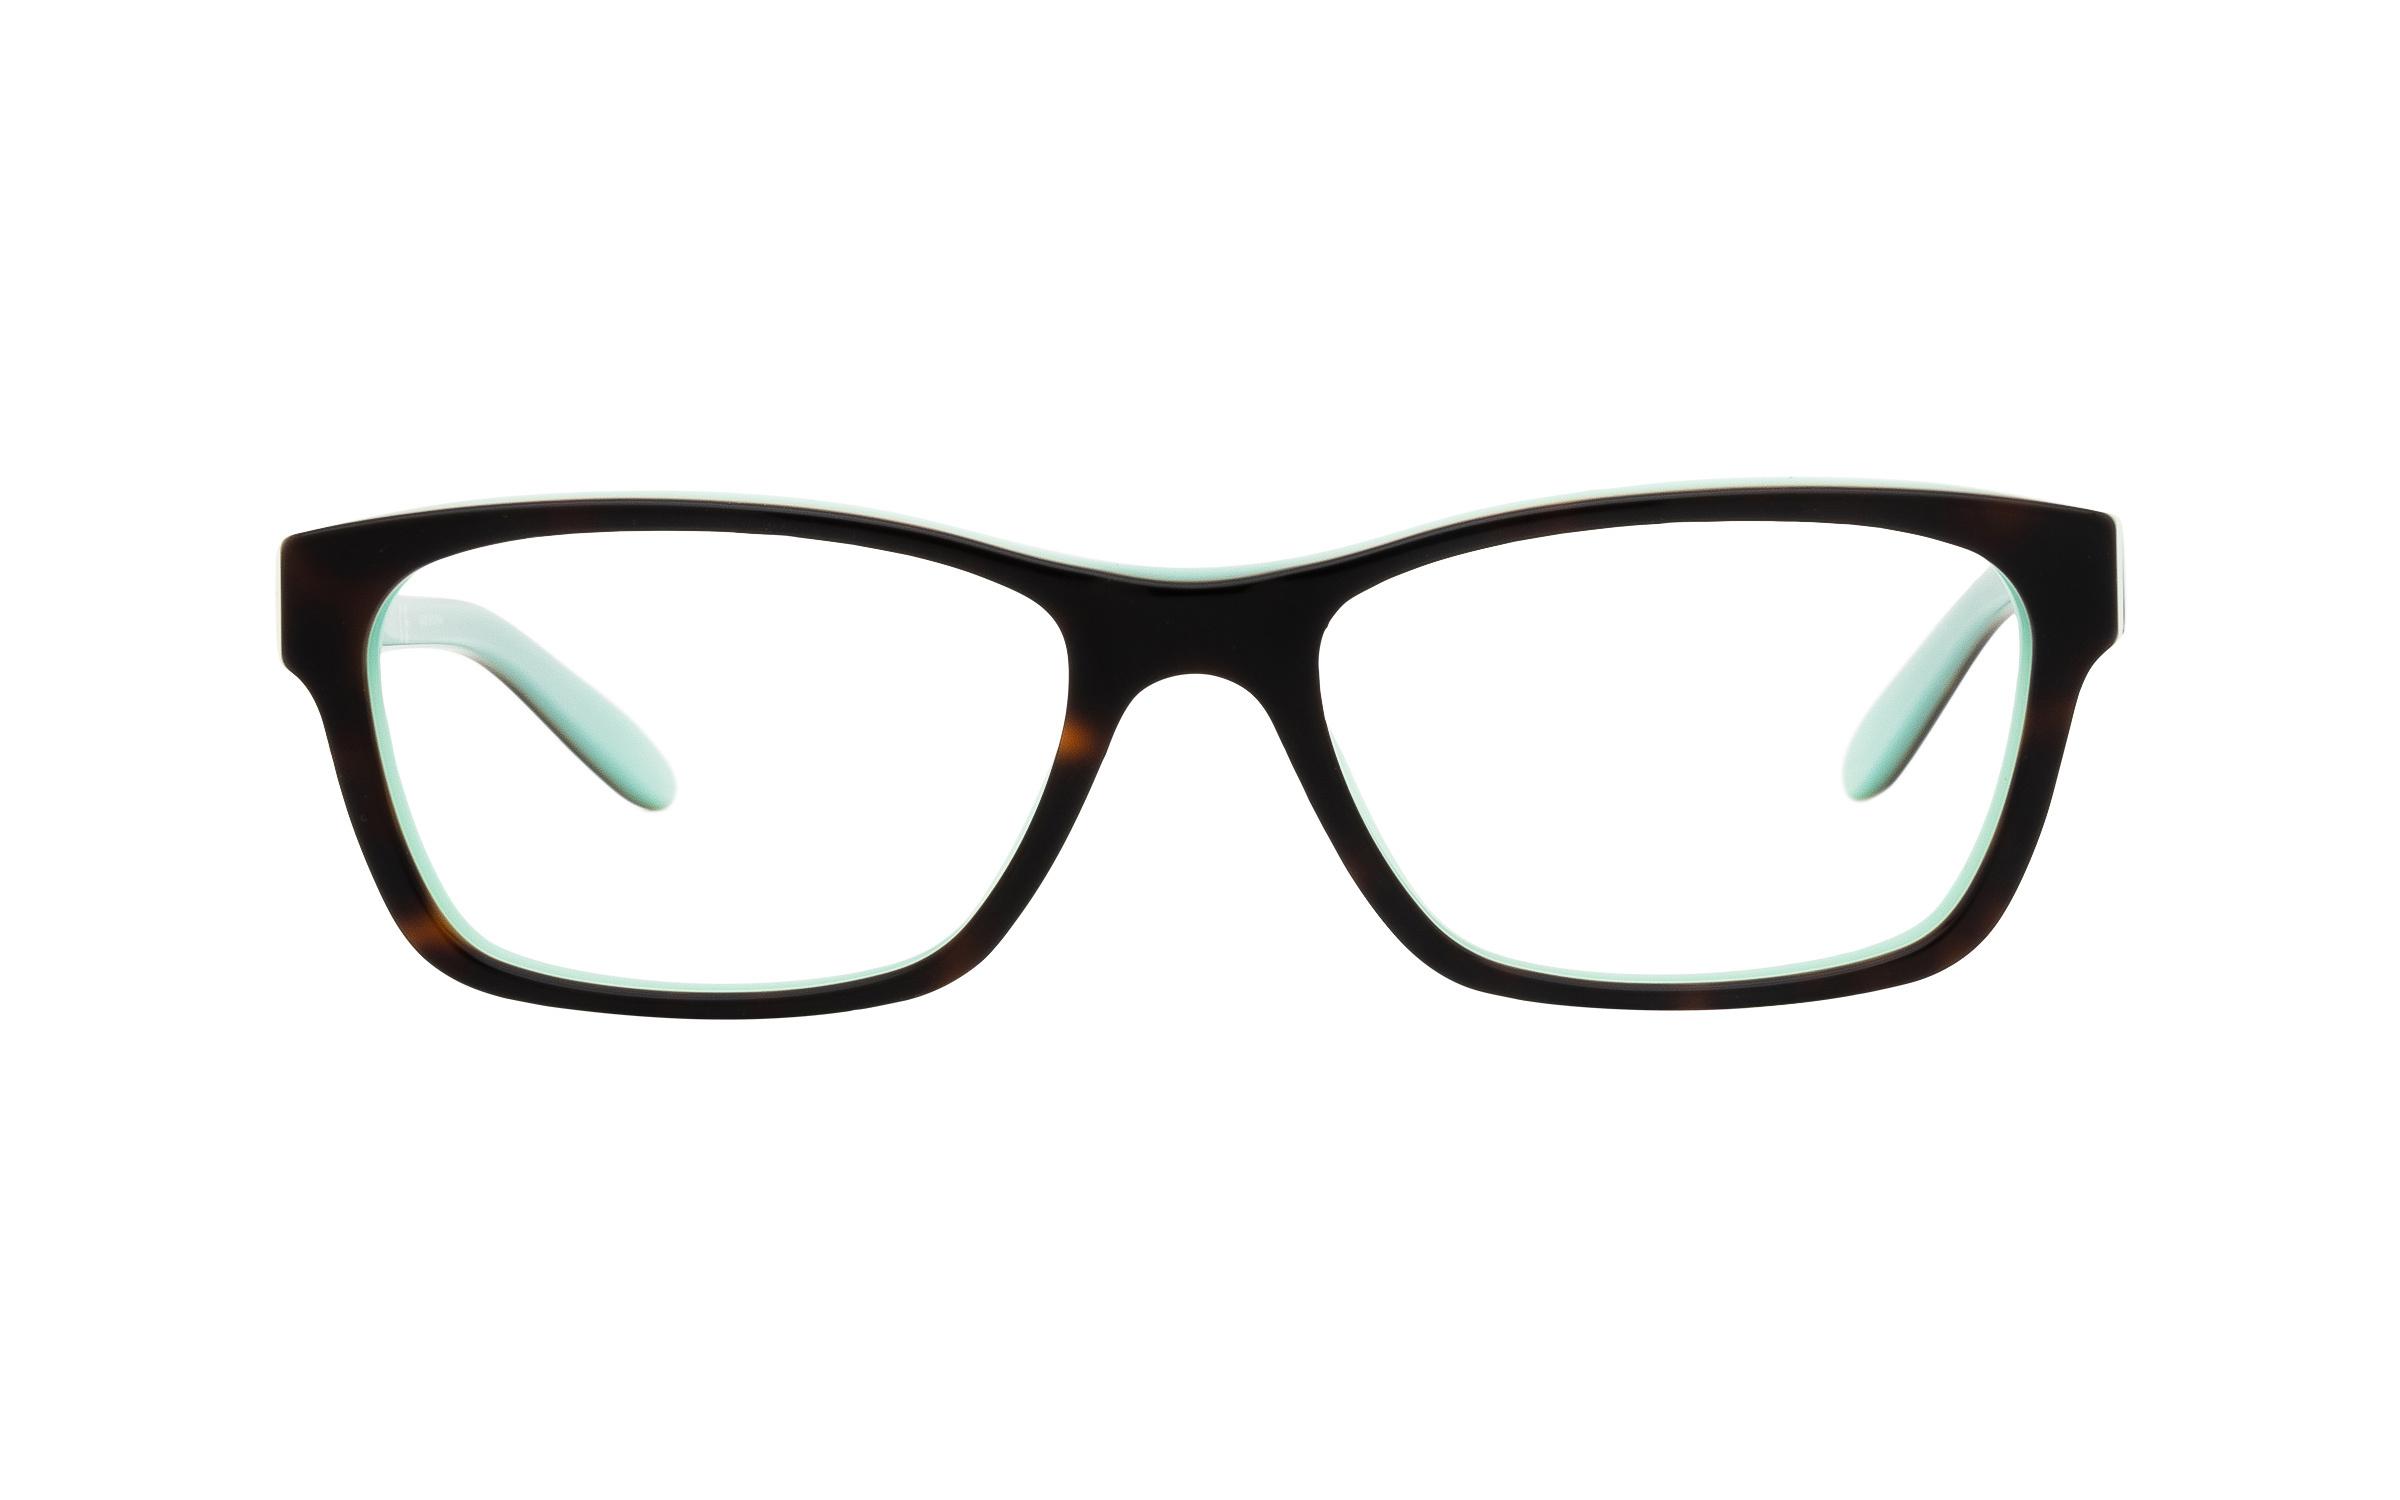 Ralph by Ralph Lauren RA7039 601 (51) Eyeglasses and Frame in Havana On Aquamarine Tortoise/Brown | Acetate - Online Coastal